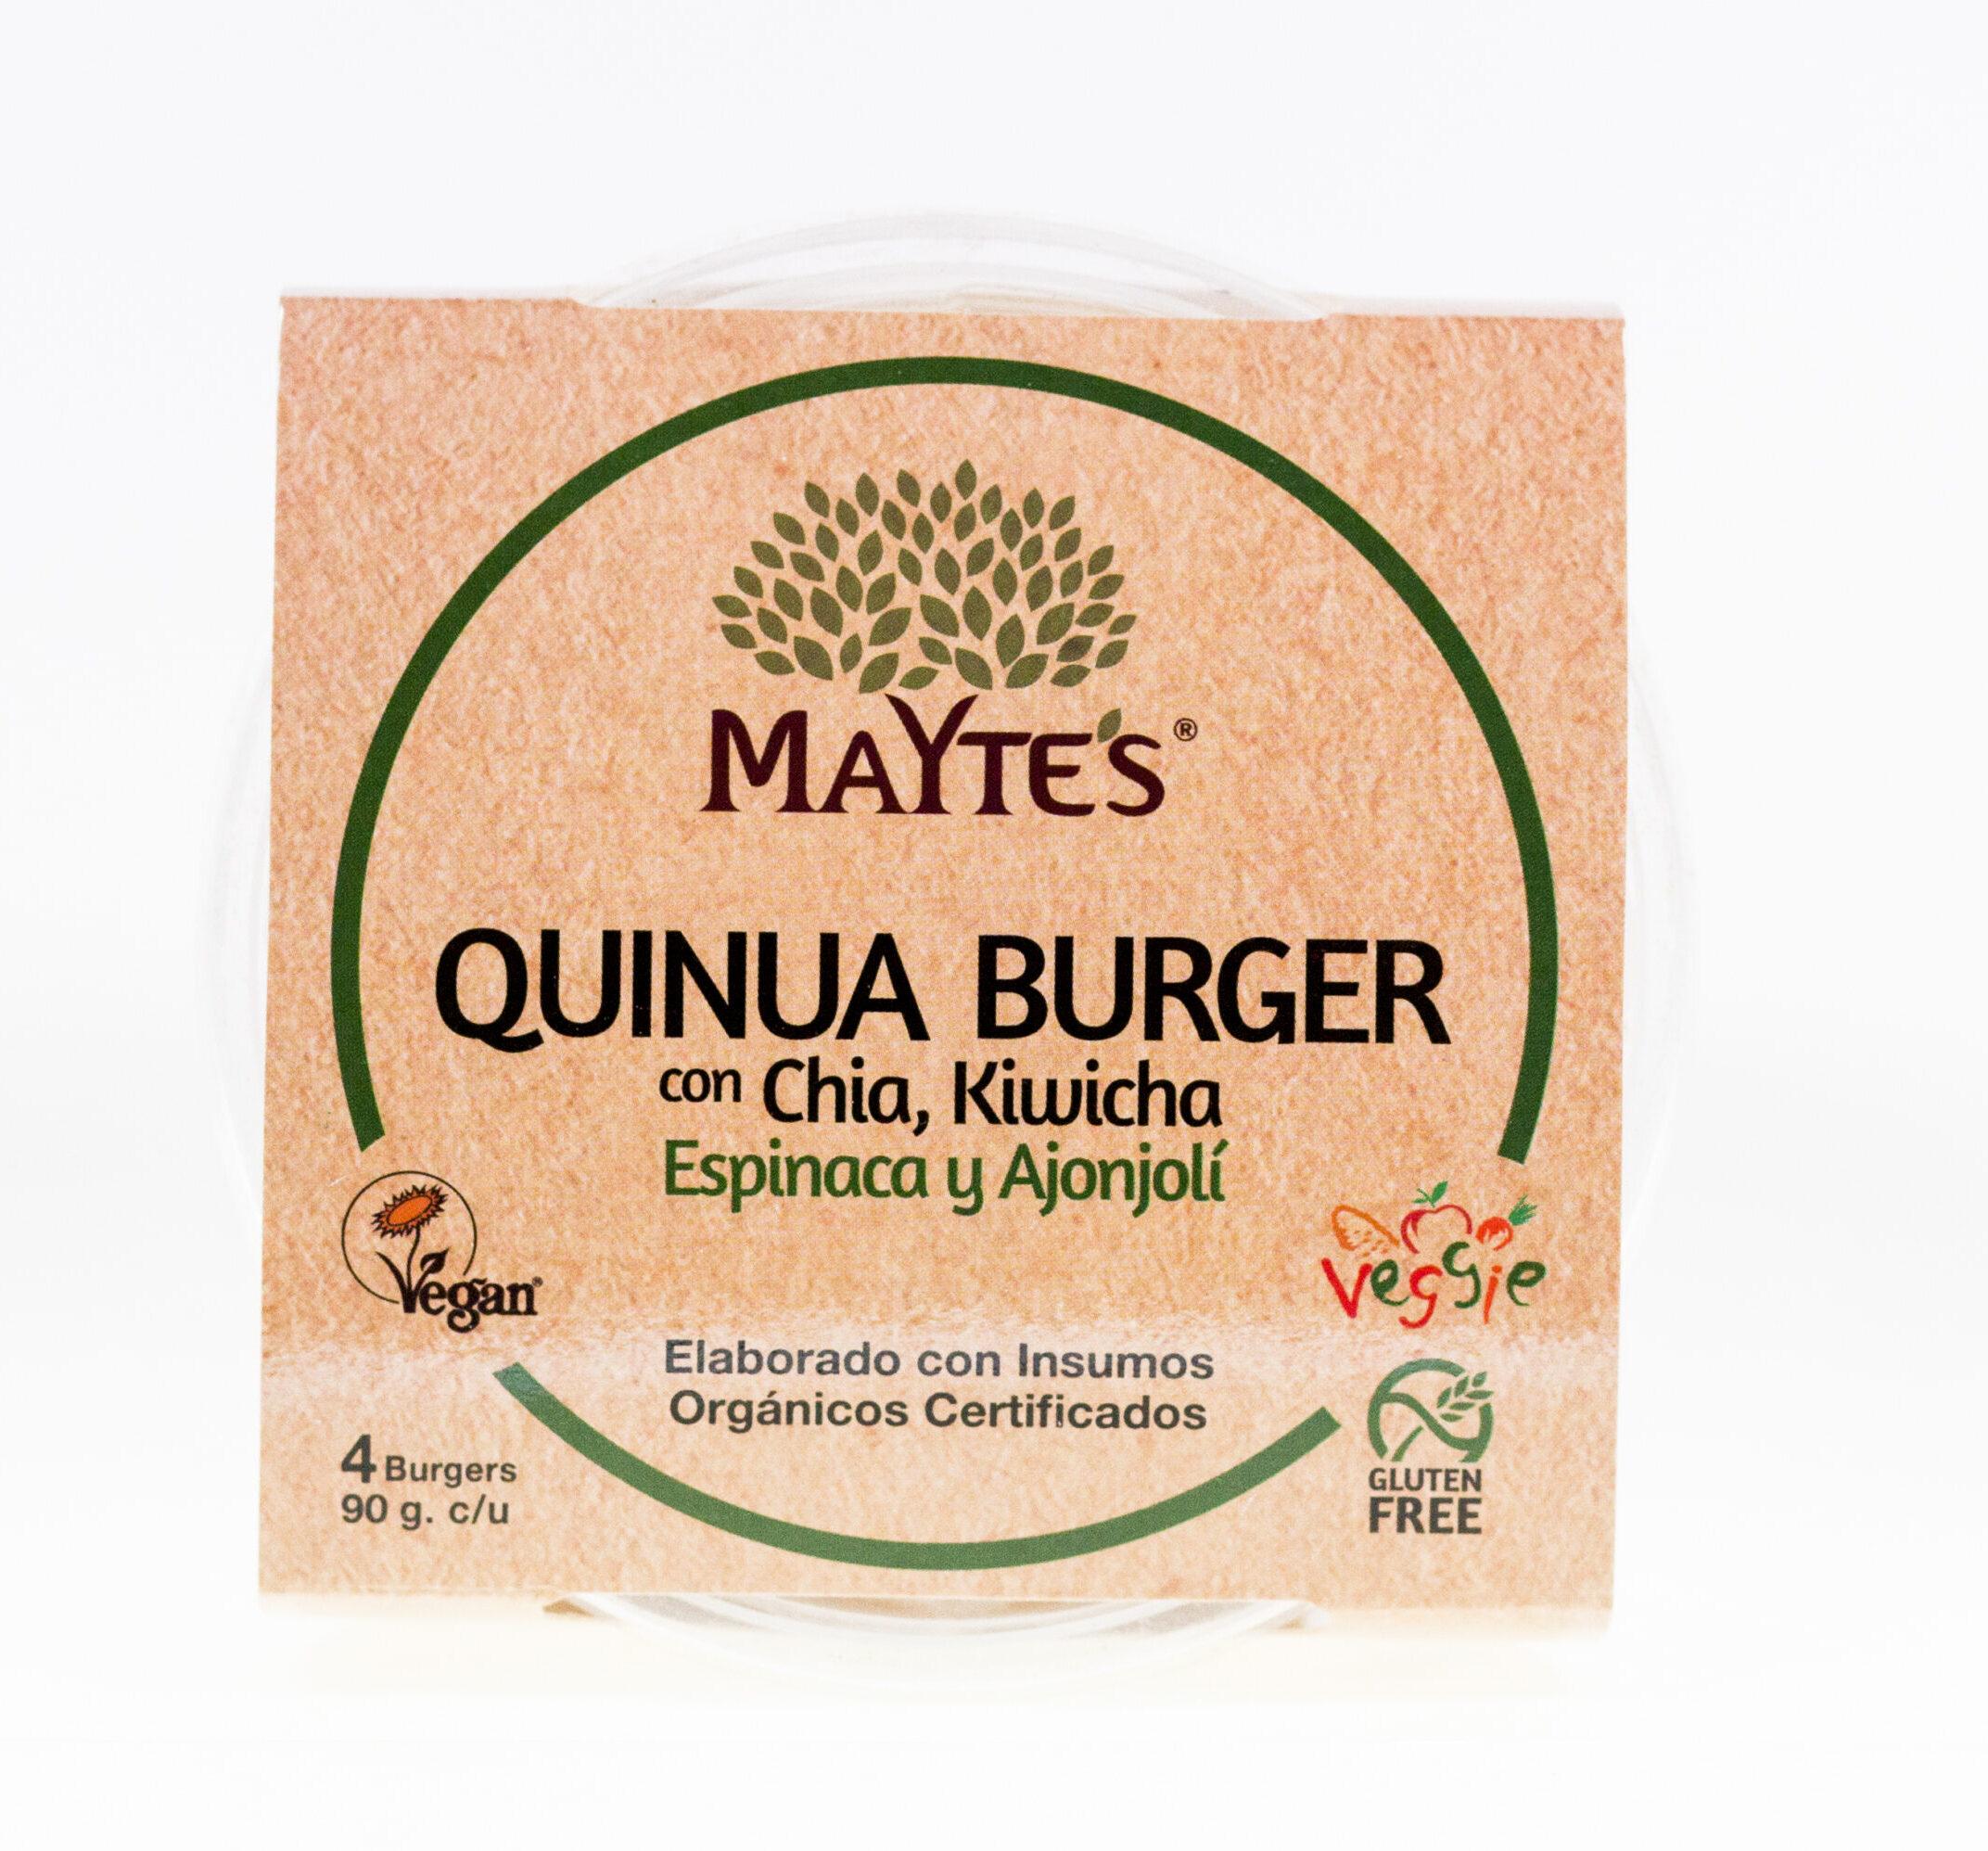 Quinua Burger con Chía, Kiwicha, Espinaca y Ajonjolí – Pack x4